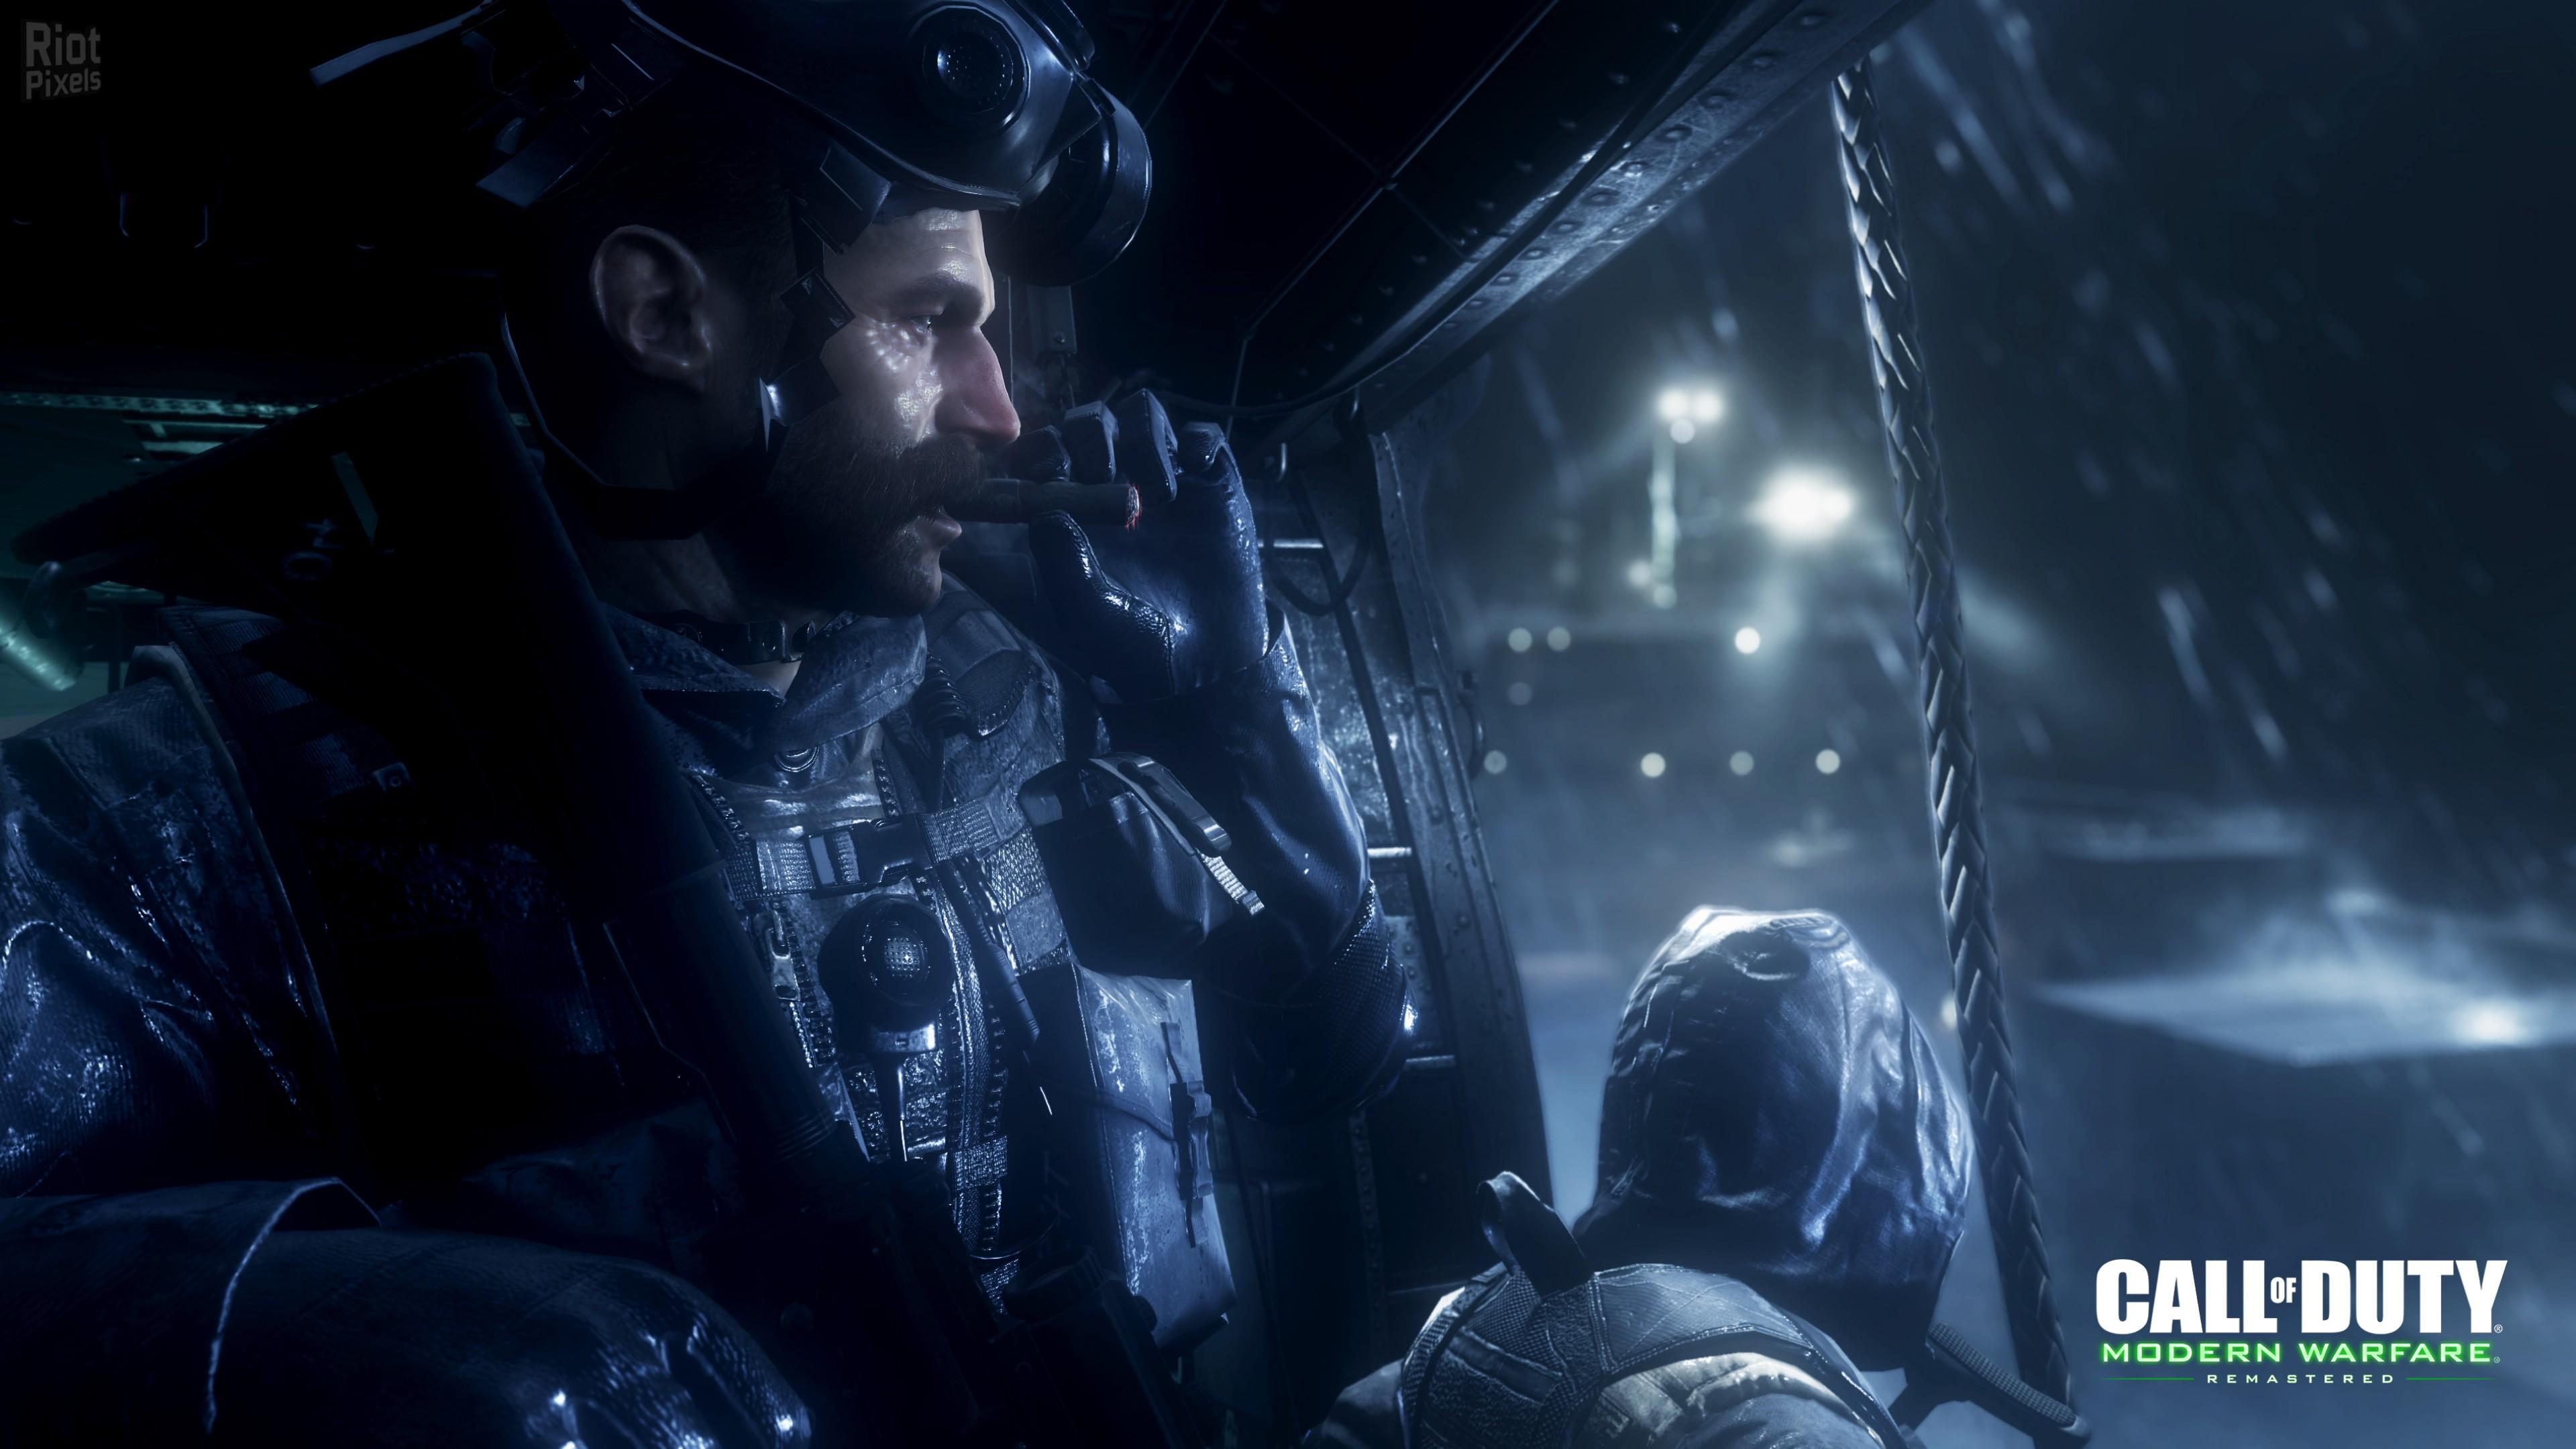 Wallpaper Call Of Duty Modern Warfare Remastered Shooter Pc Ps